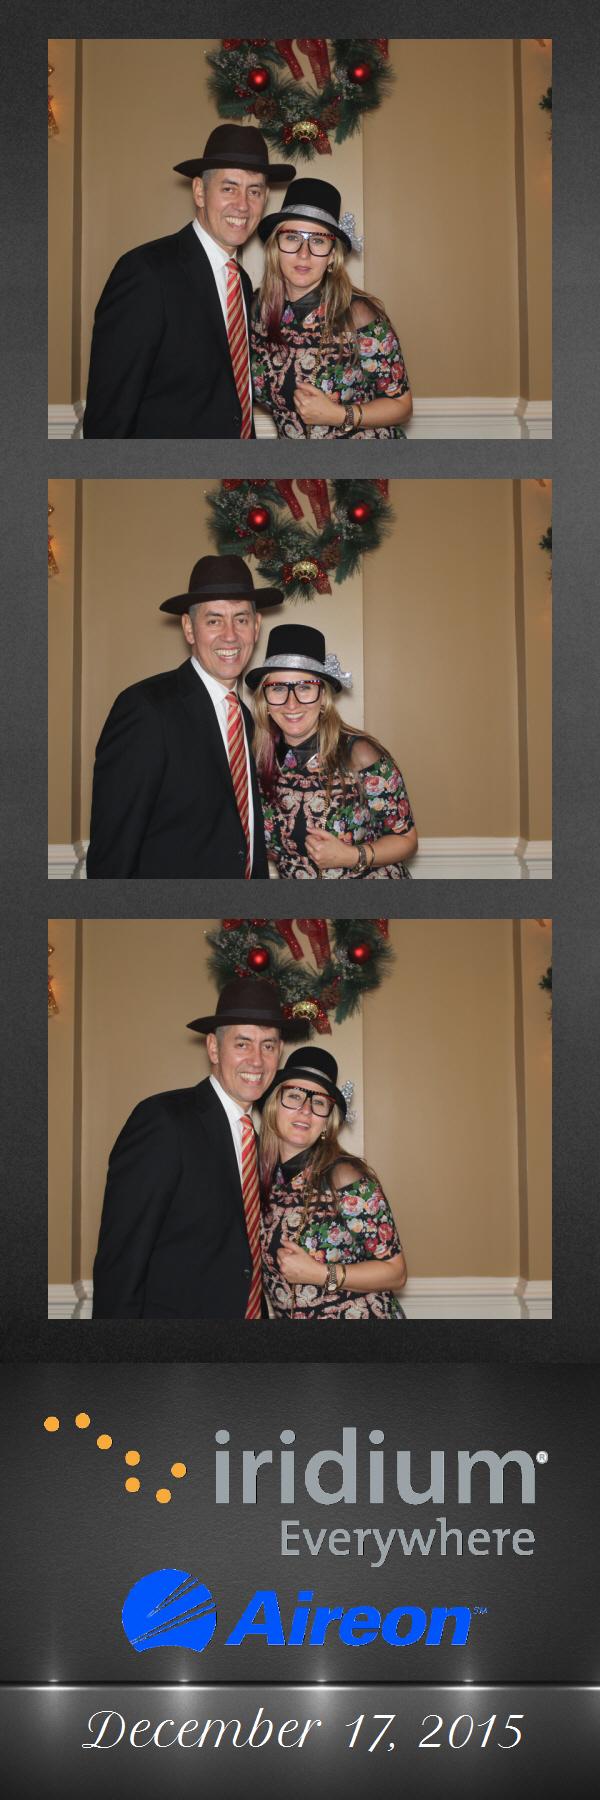 Guest House Events Photo Booth Iridium (33).jpg